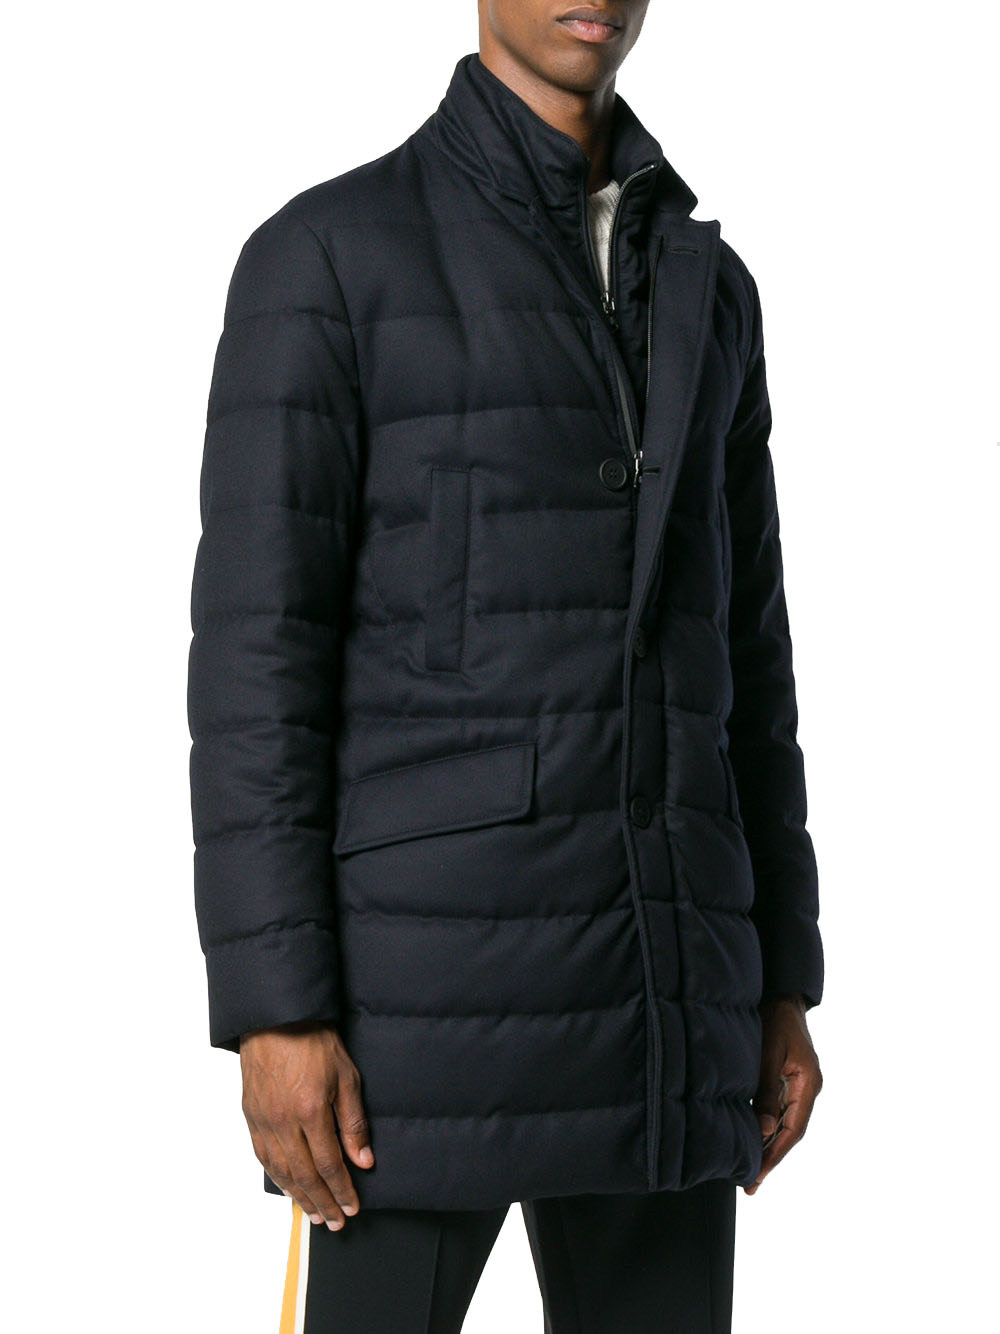 Moncler Men's Wool Coat | Upp till 70% |